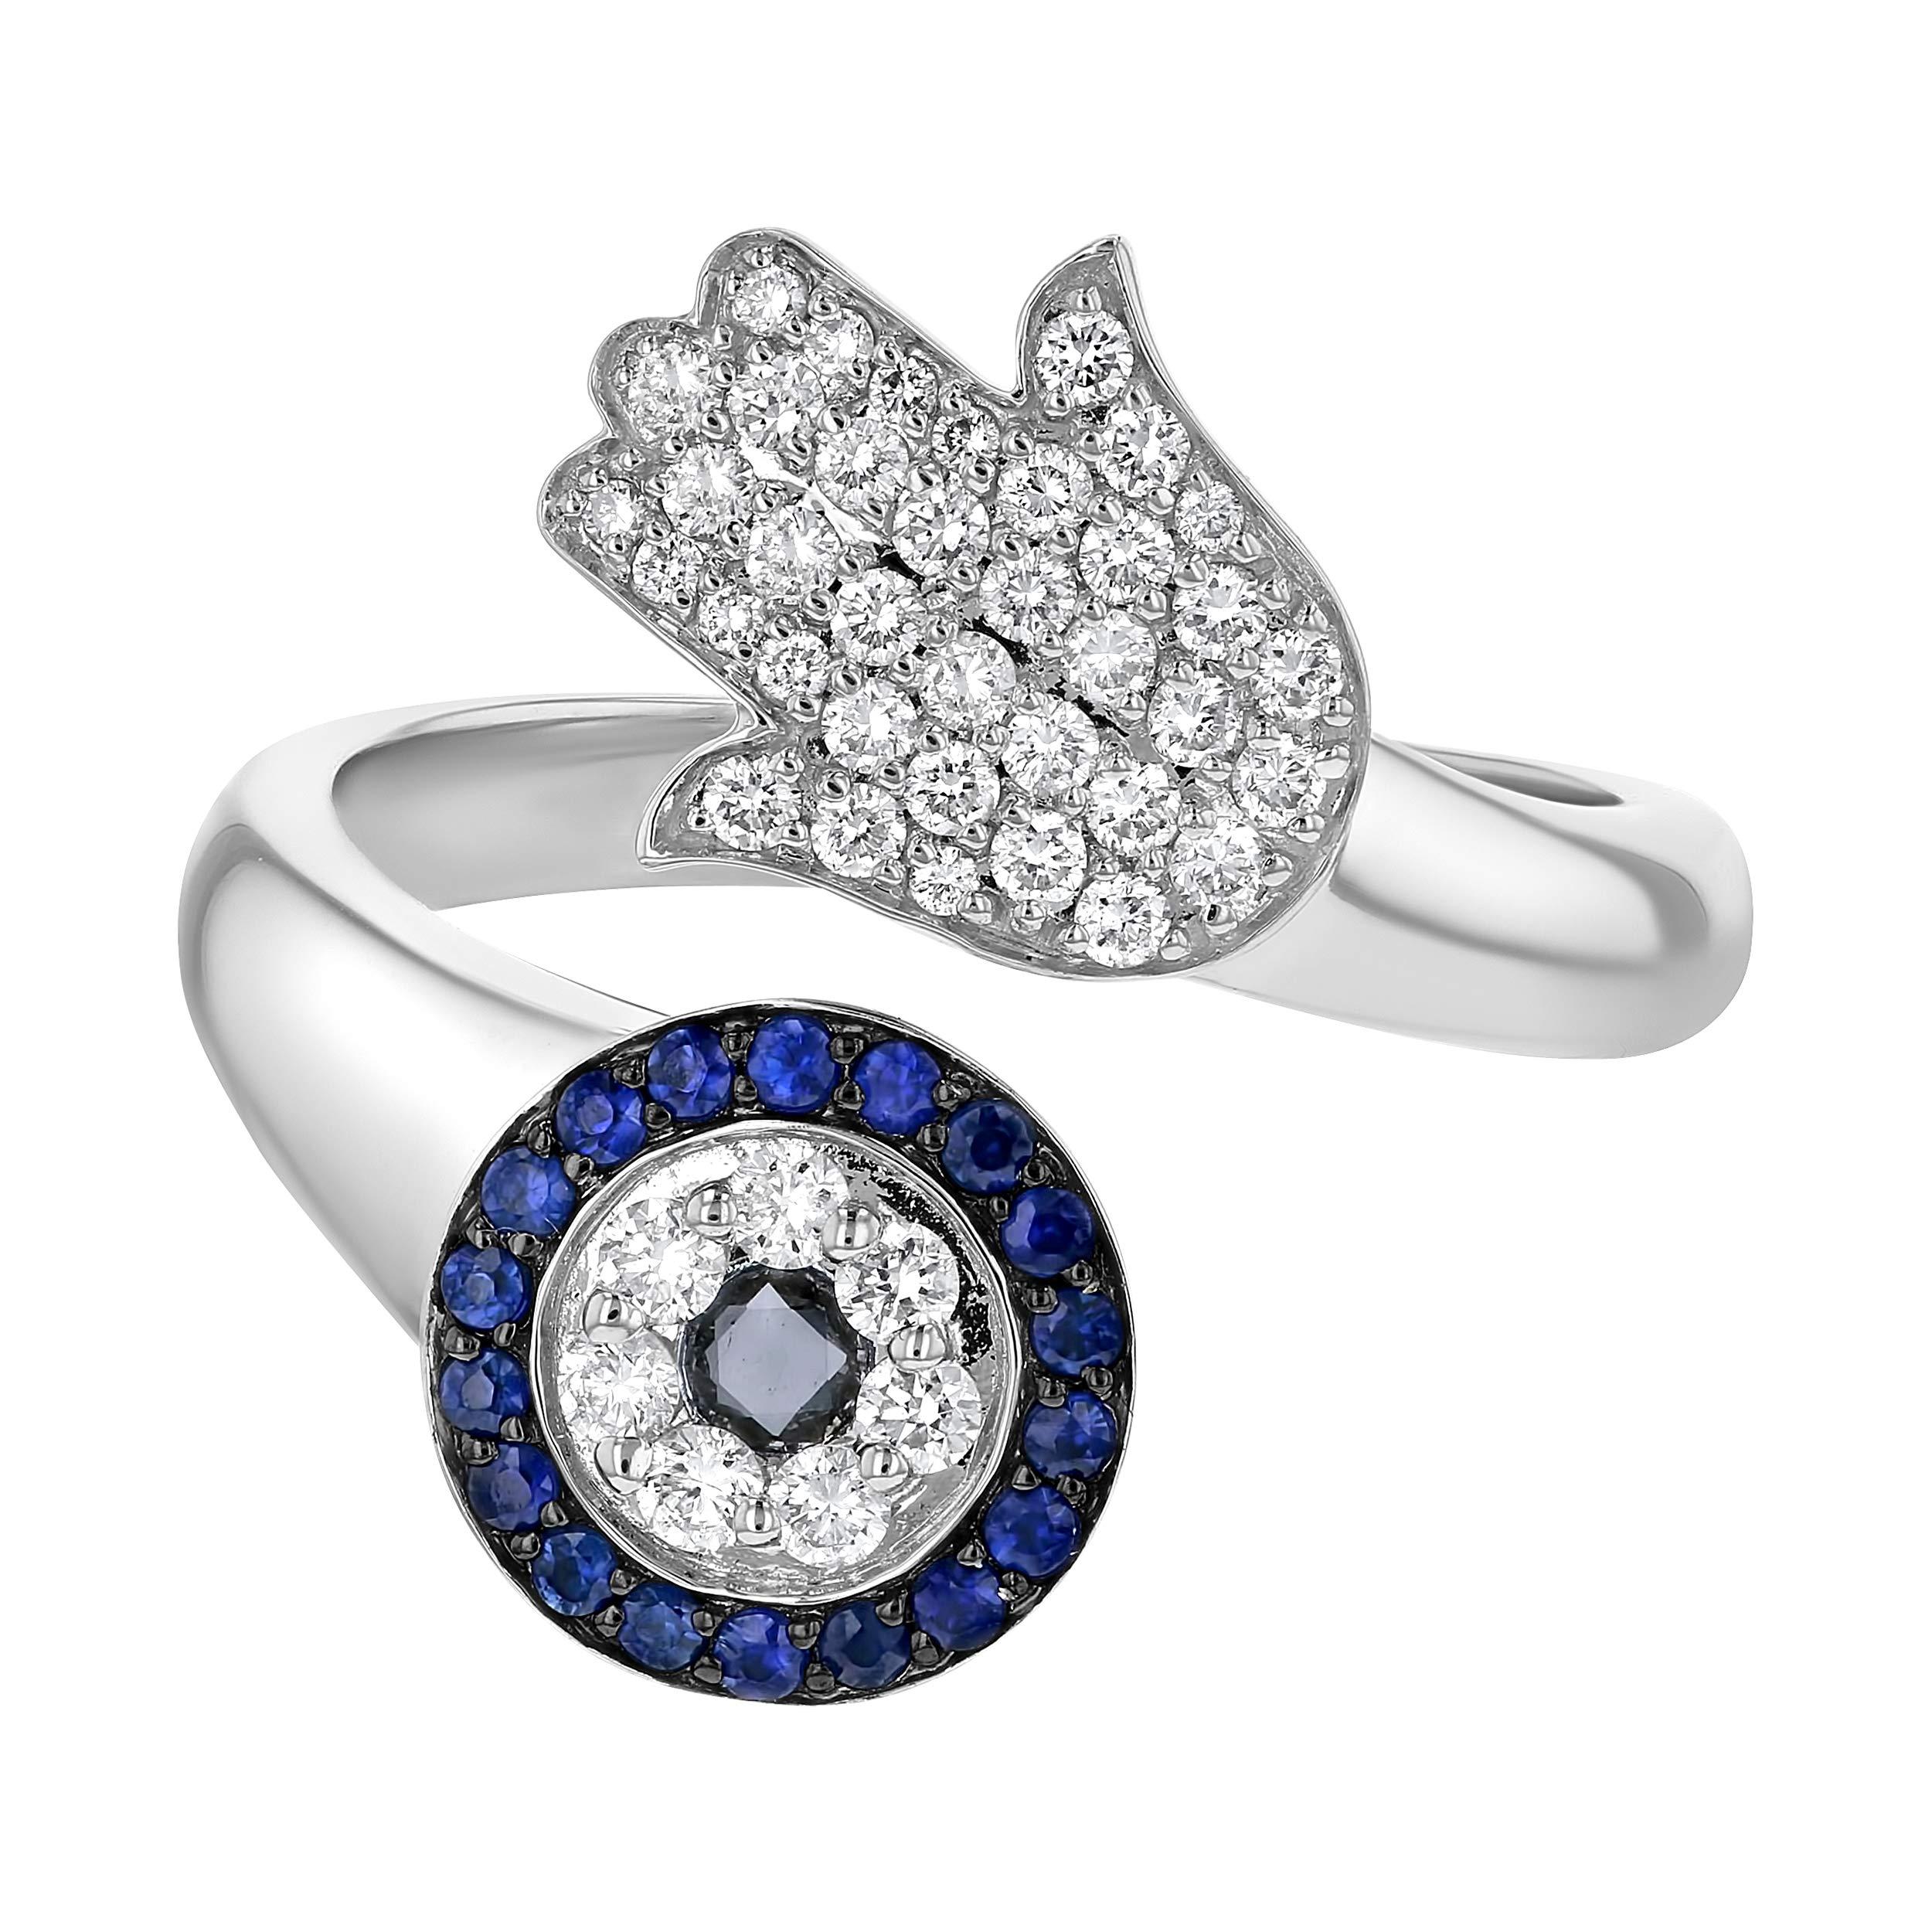 Olivia Paris 14k White Gold Diamond and Blue Sapphire Hamsa Bypass Cocktail Ring (3/8 cttw, H-I, I1) (6) by Olivia Paris